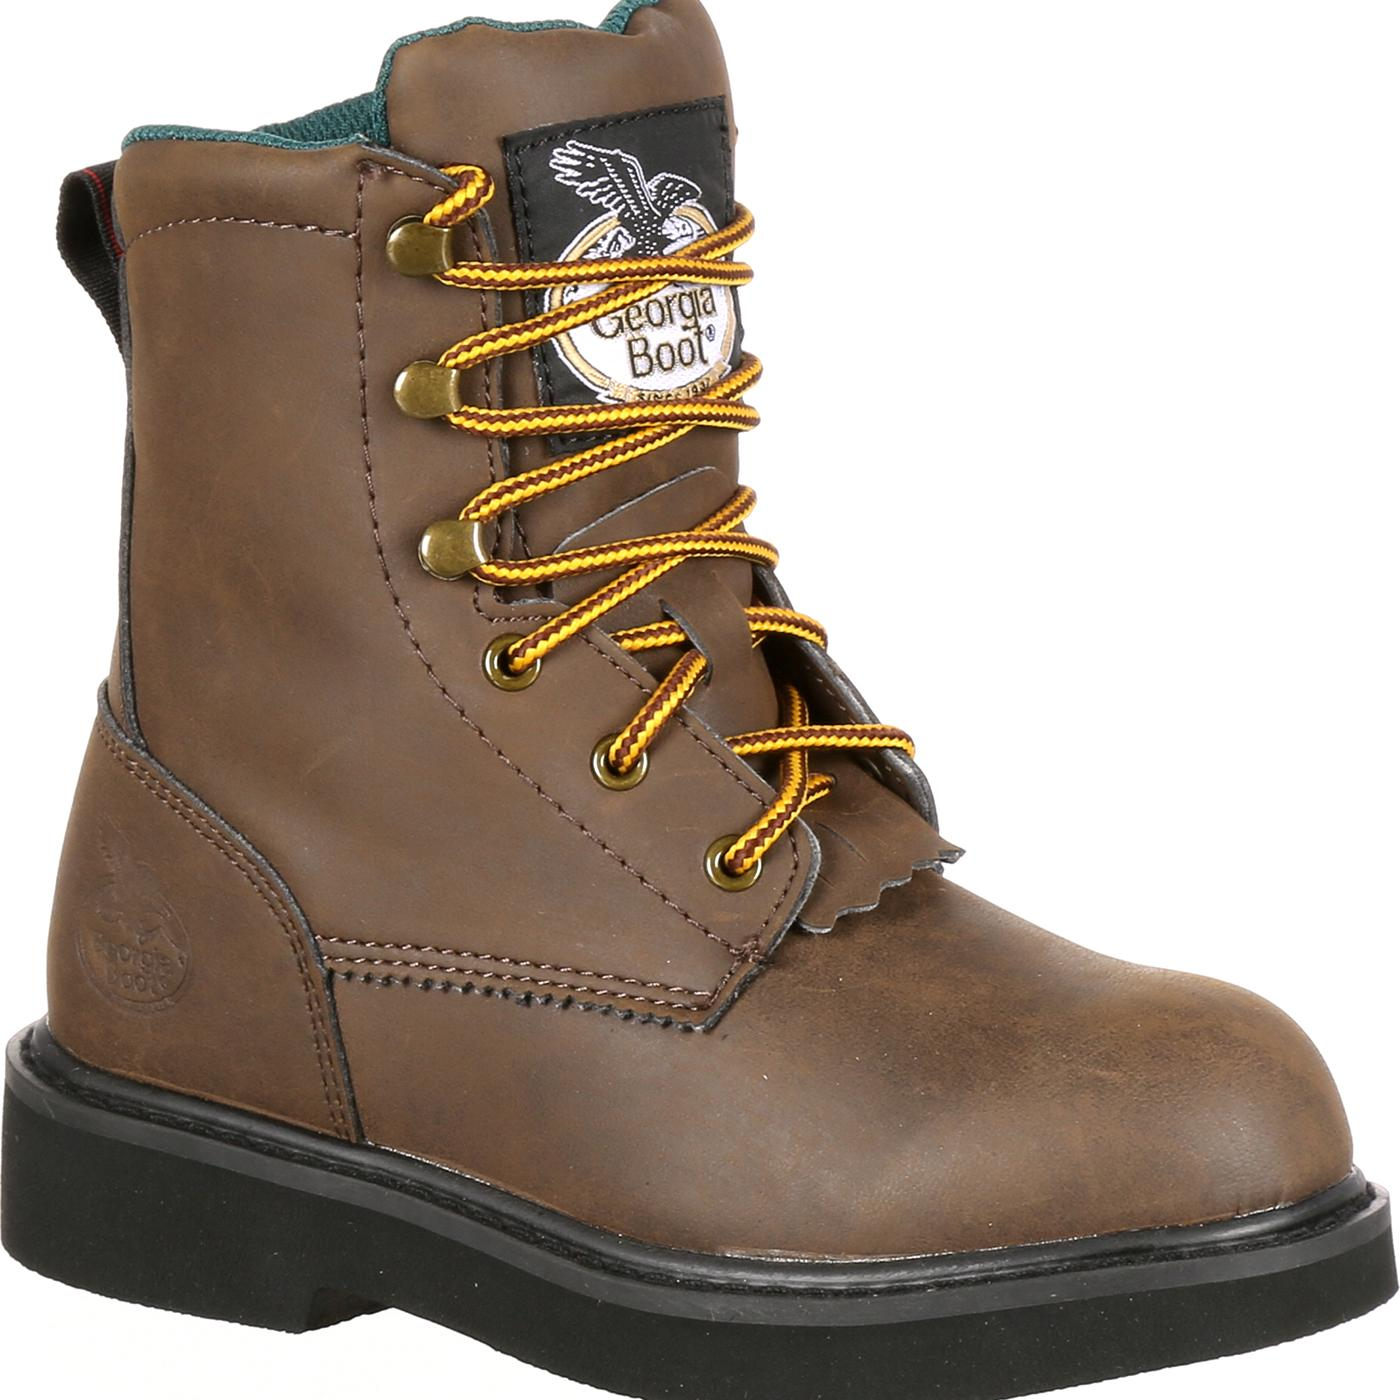 ccac48057f4 Georgia Boot Kids' Lacer Work Boot